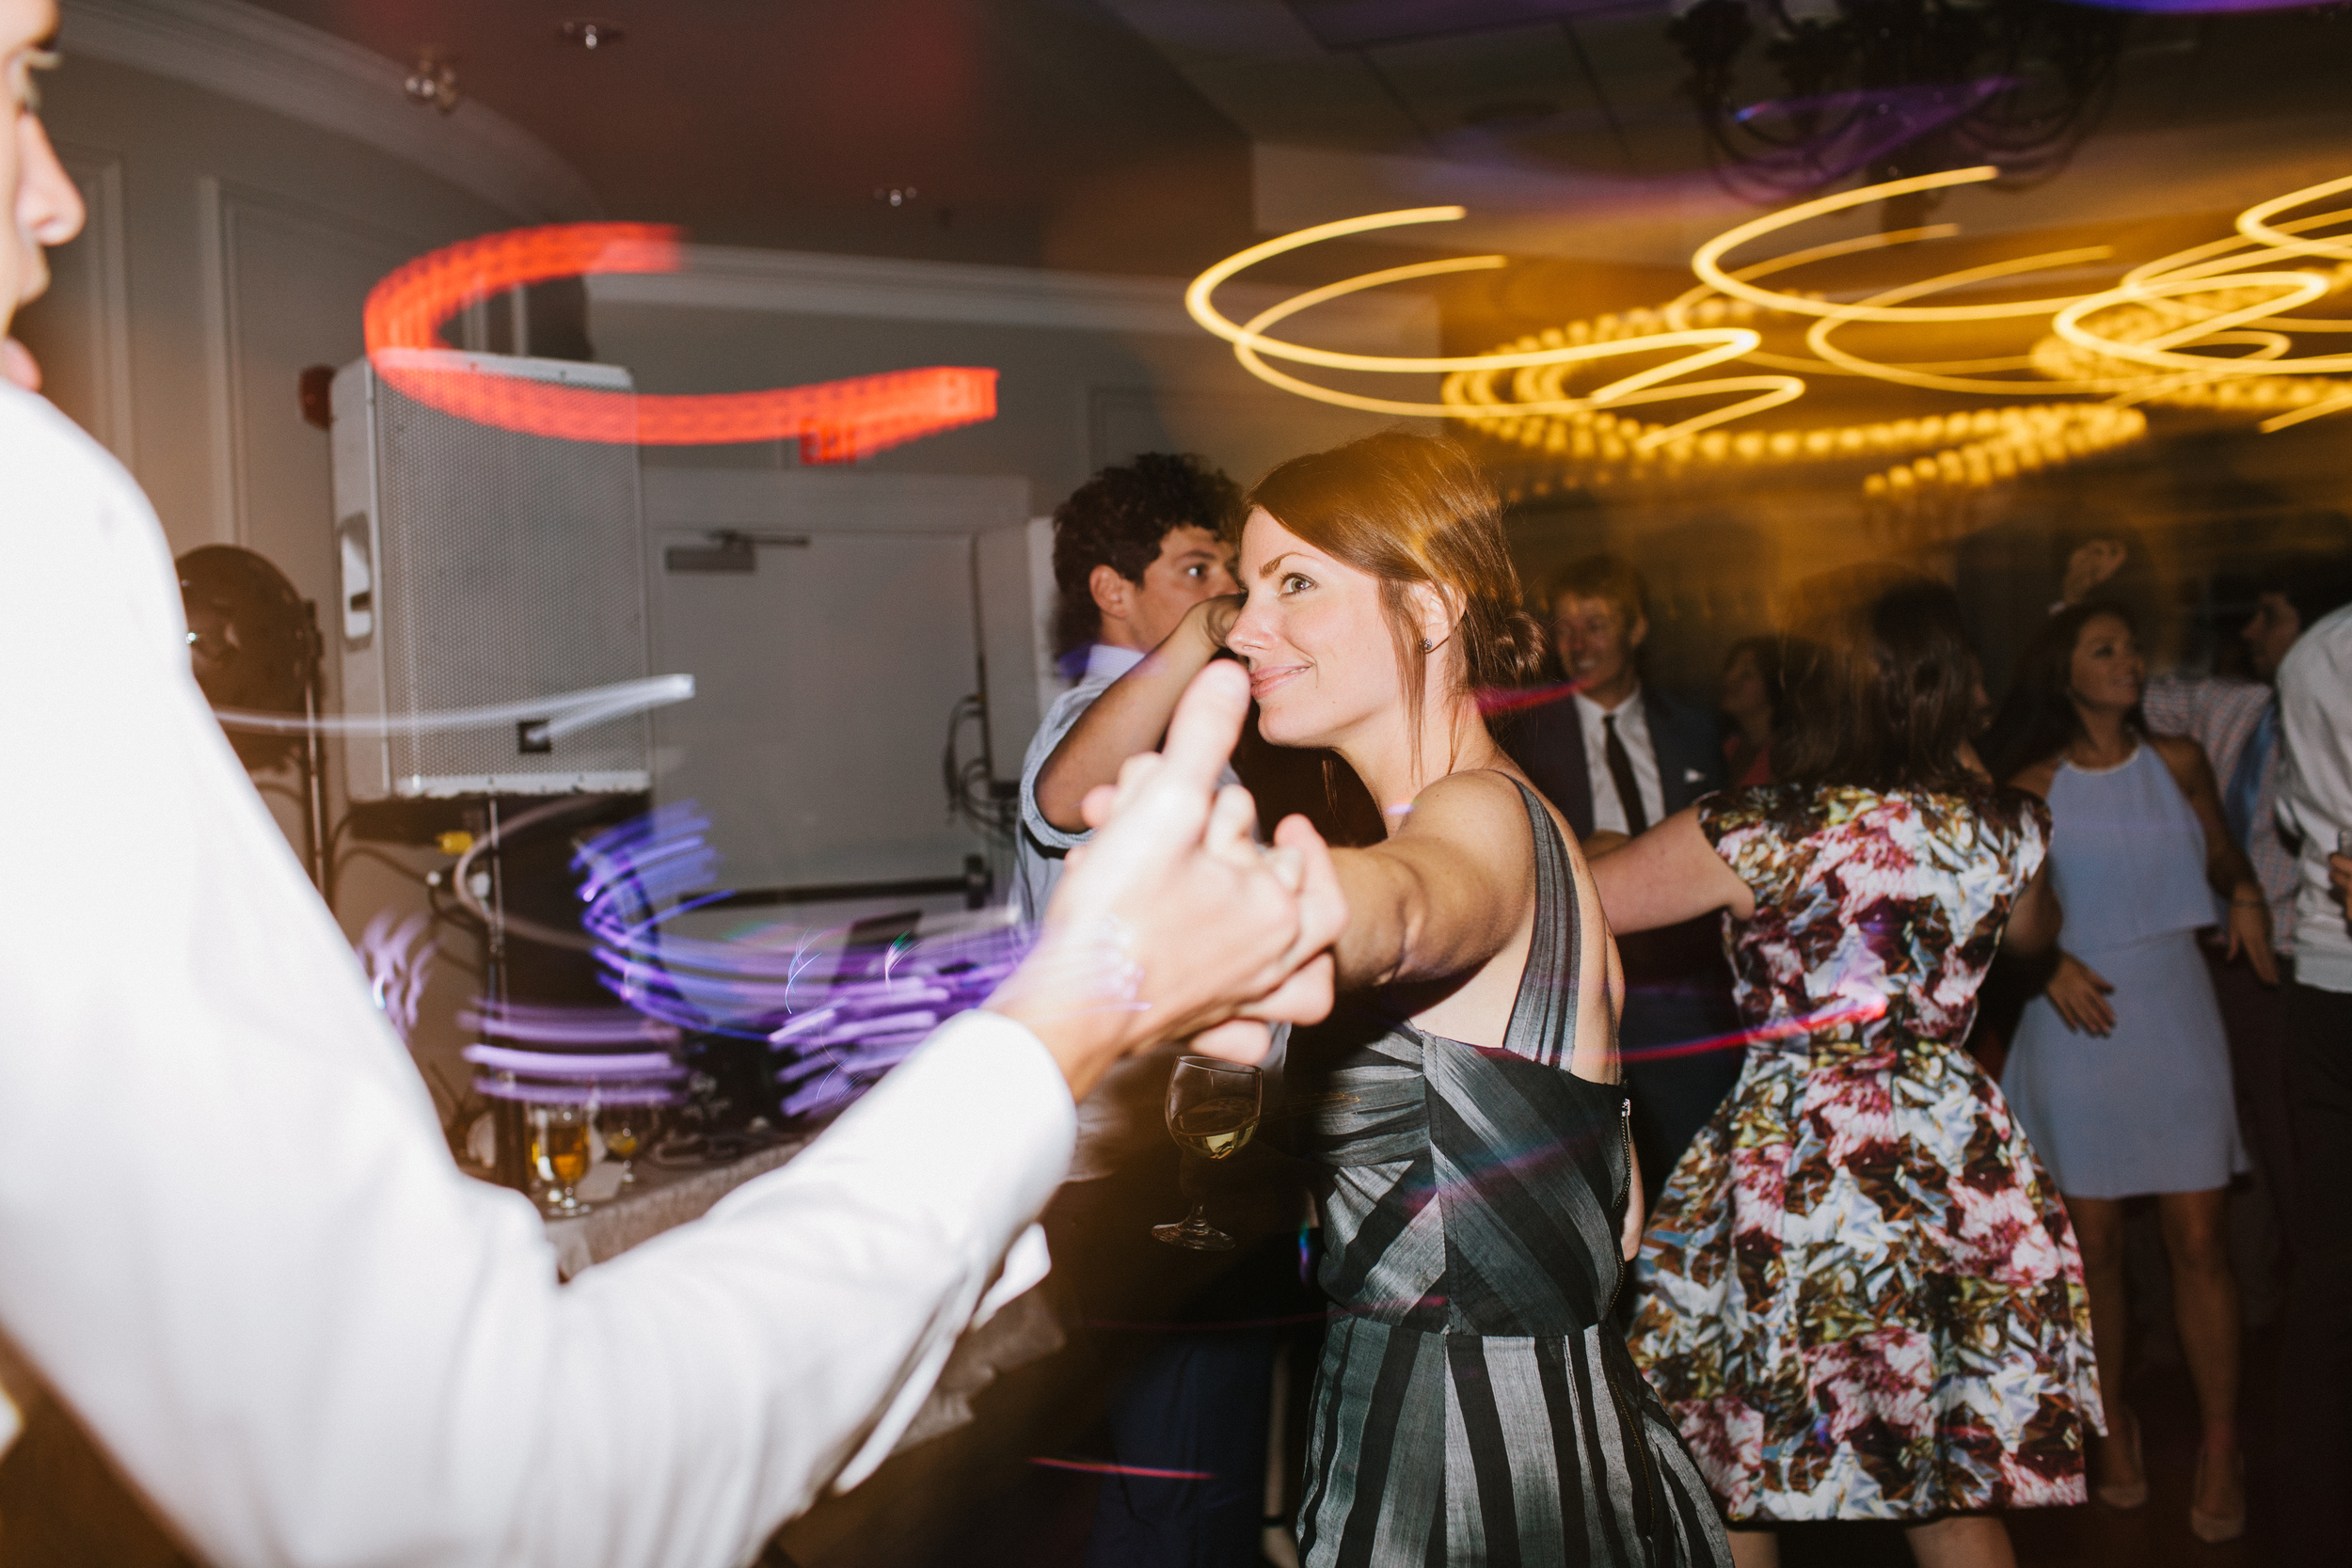 harbour-banquet-hall-oakville-wedding-photographer-michael-rousseau-photography-persian-wedding-photographer-isabella-daniel055.JPG